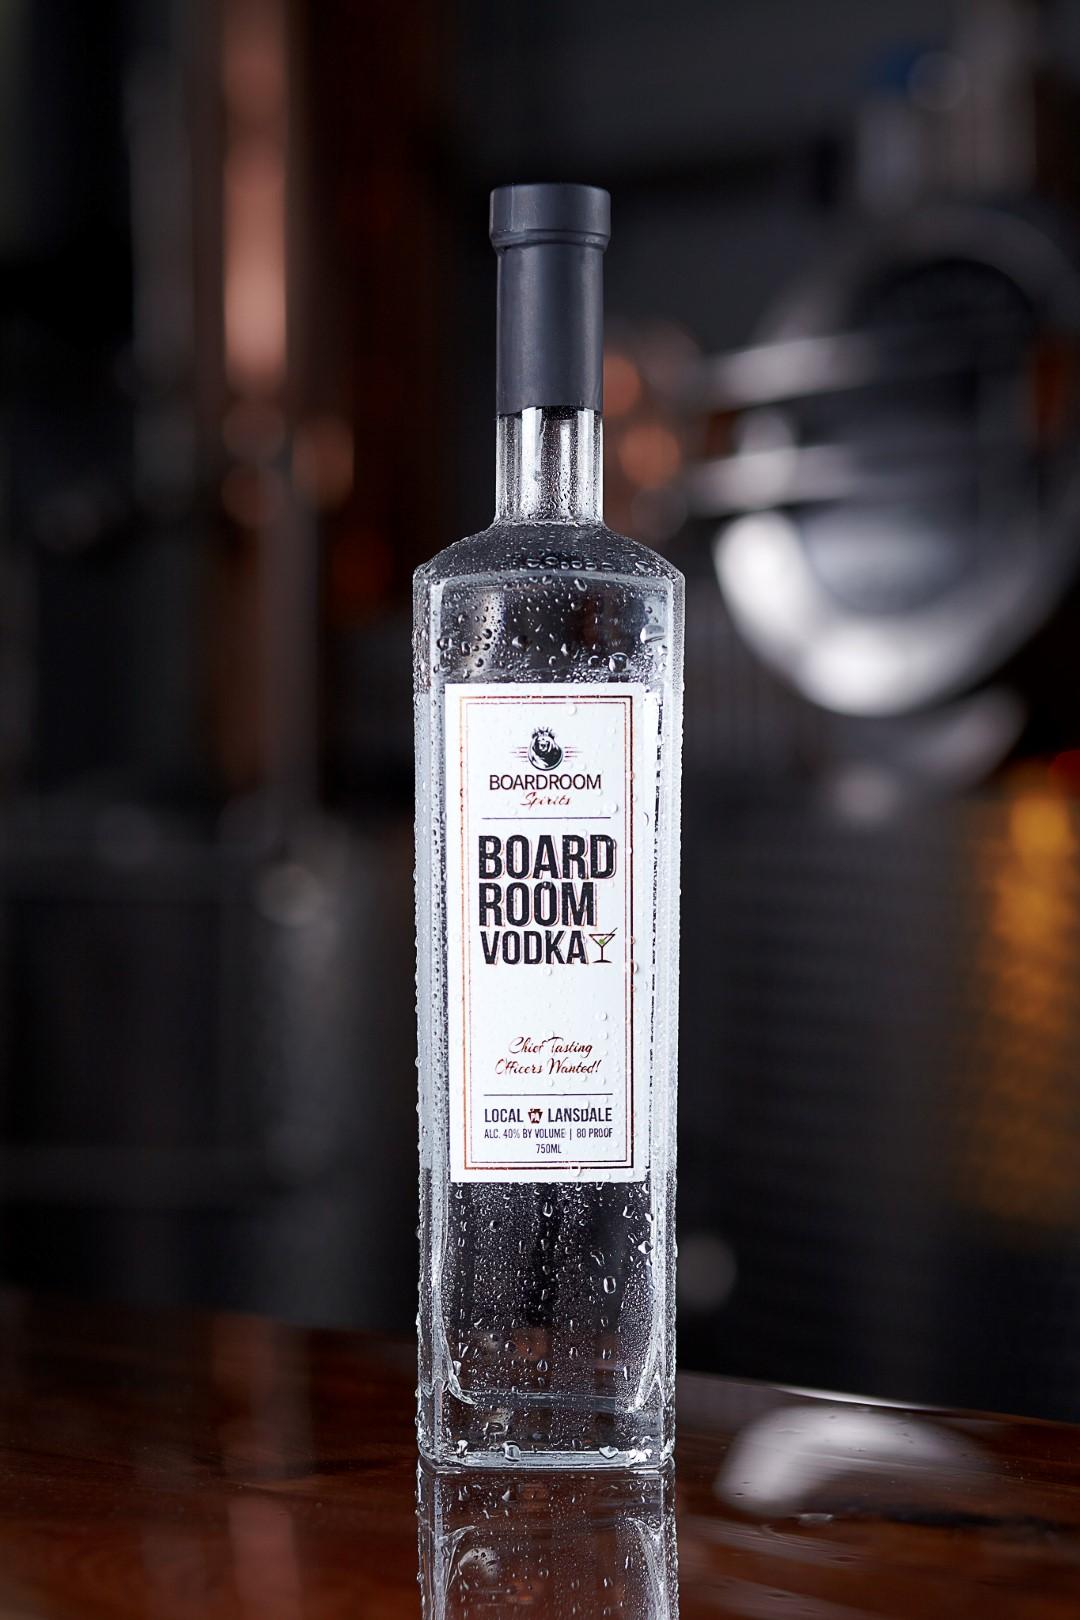 Boardroom Vodka